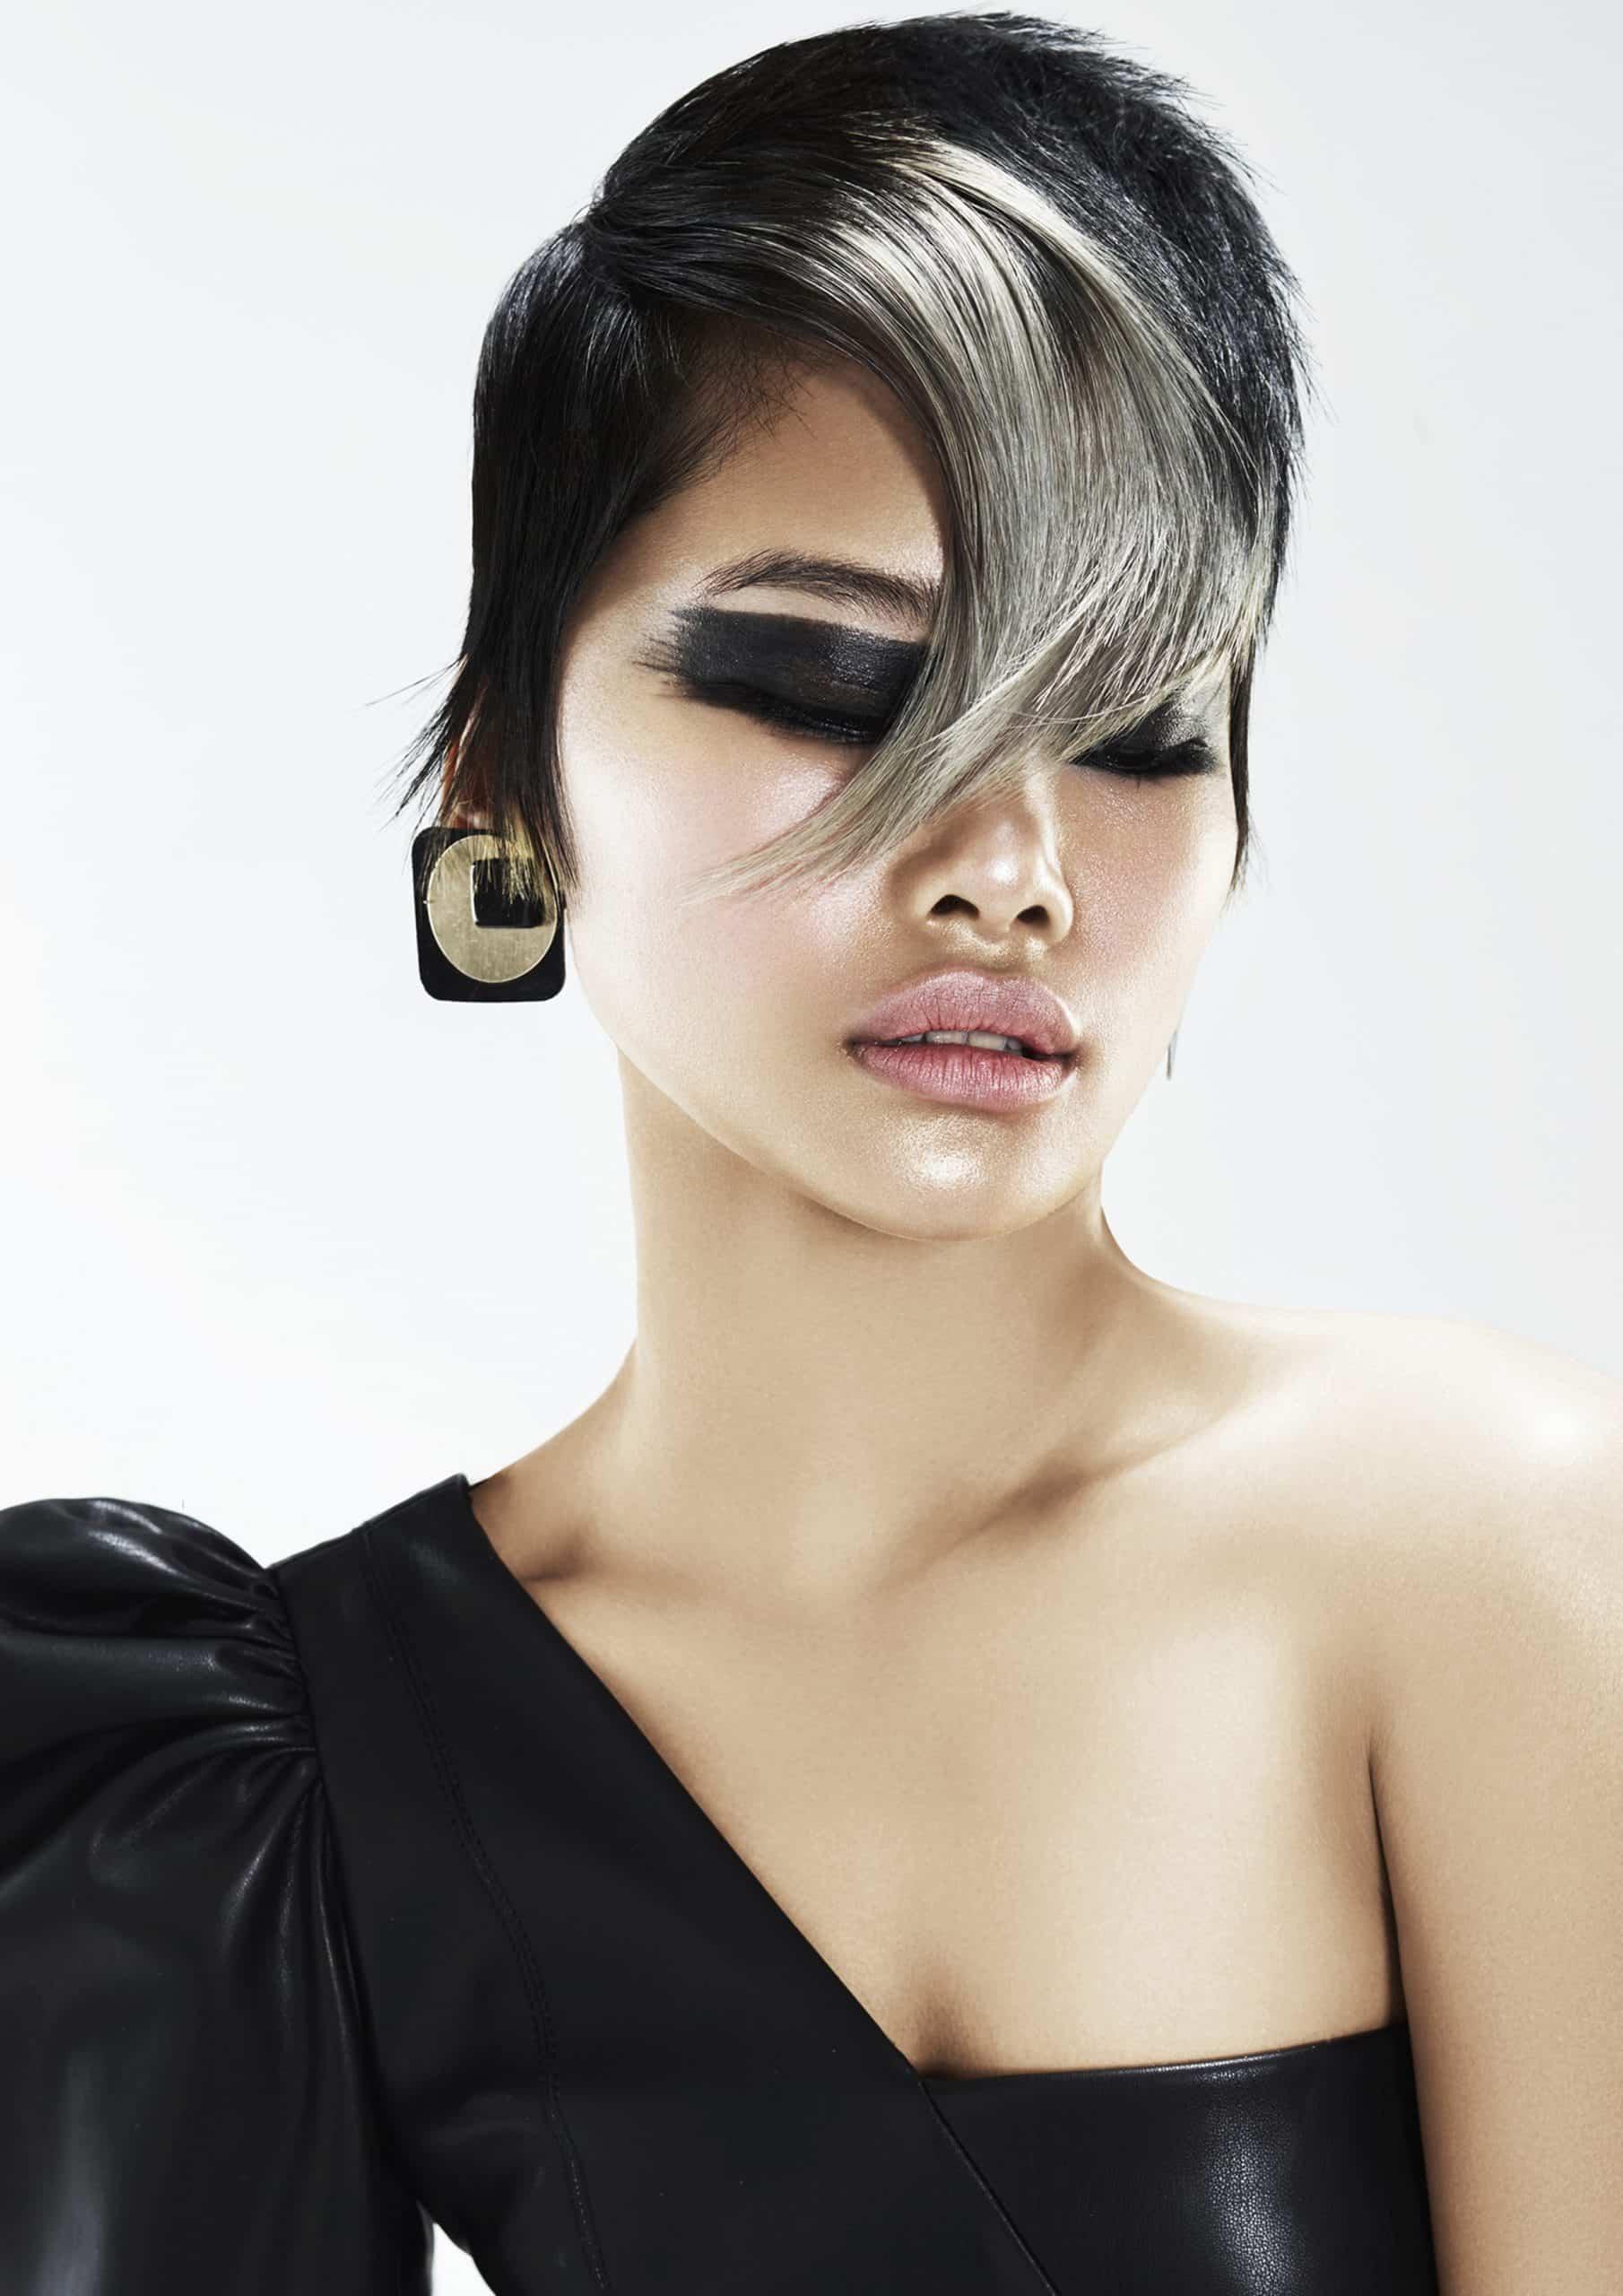 Haircutting_Alain Pereque_Image 1